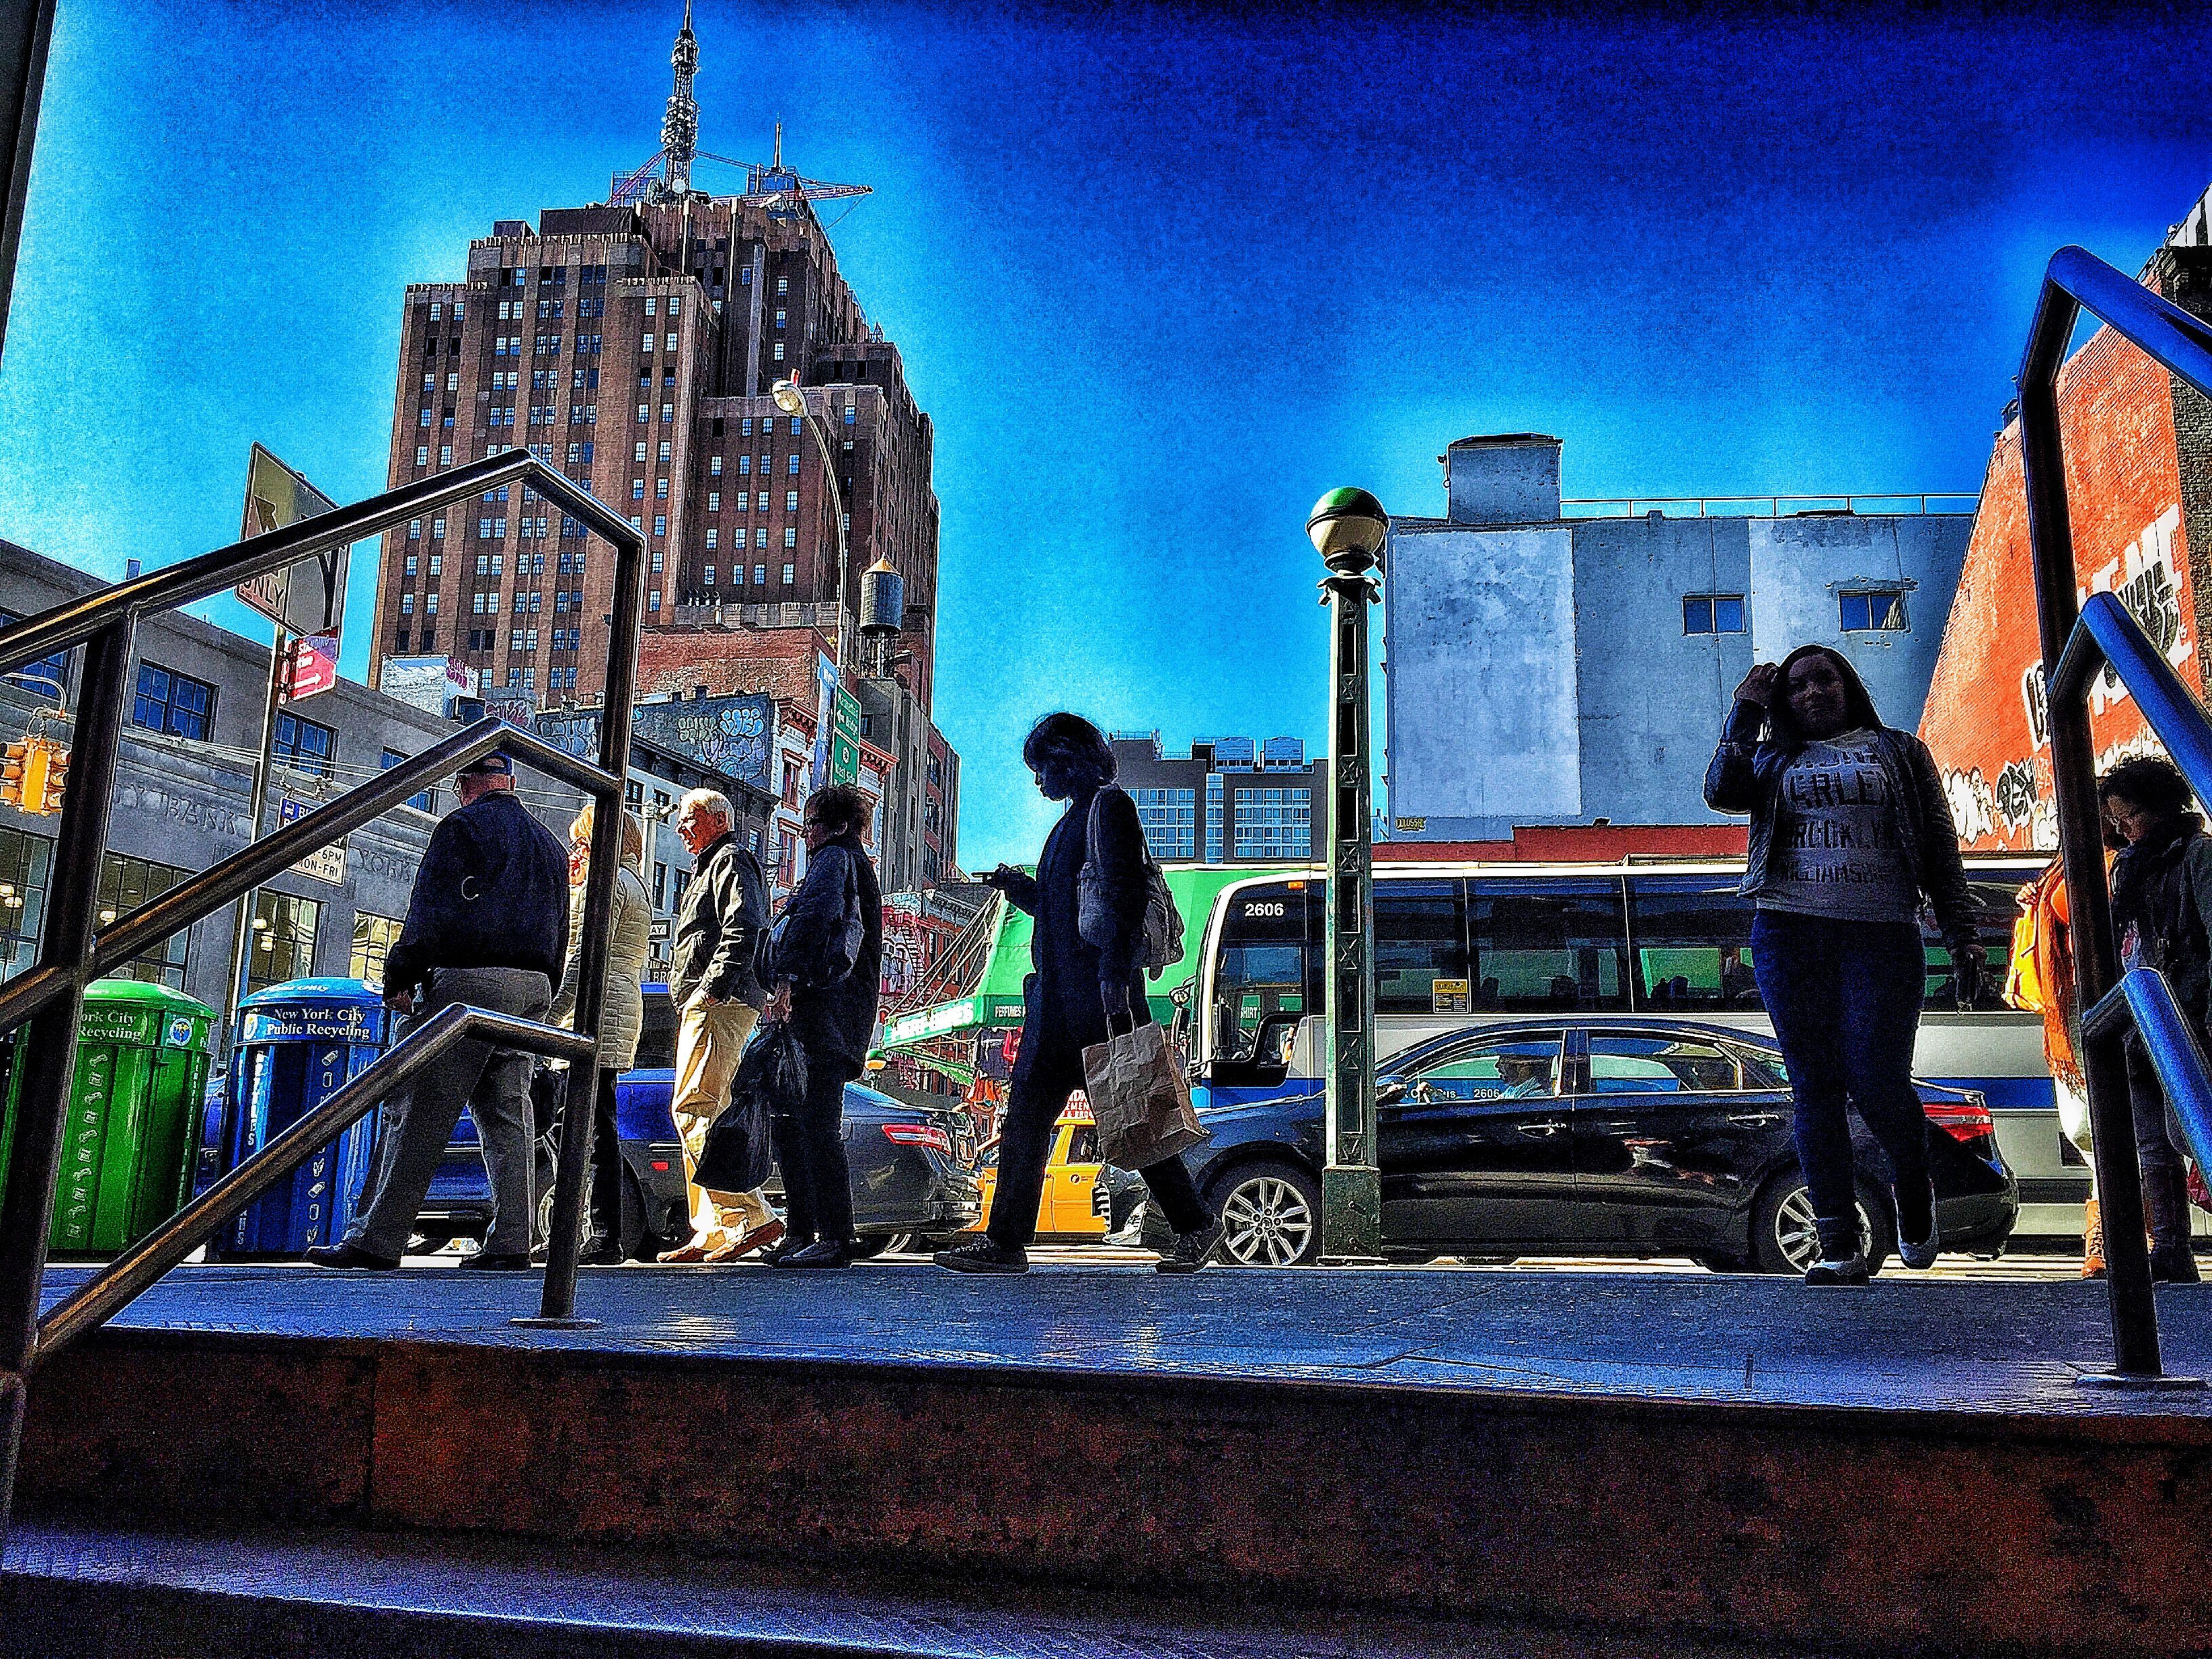 building exterior, architecture, built structure, art, art and craft, sky, blue, lifestyles, human representation, creativity, men, city, leisure activity, statue, street, graffiti, sculpture